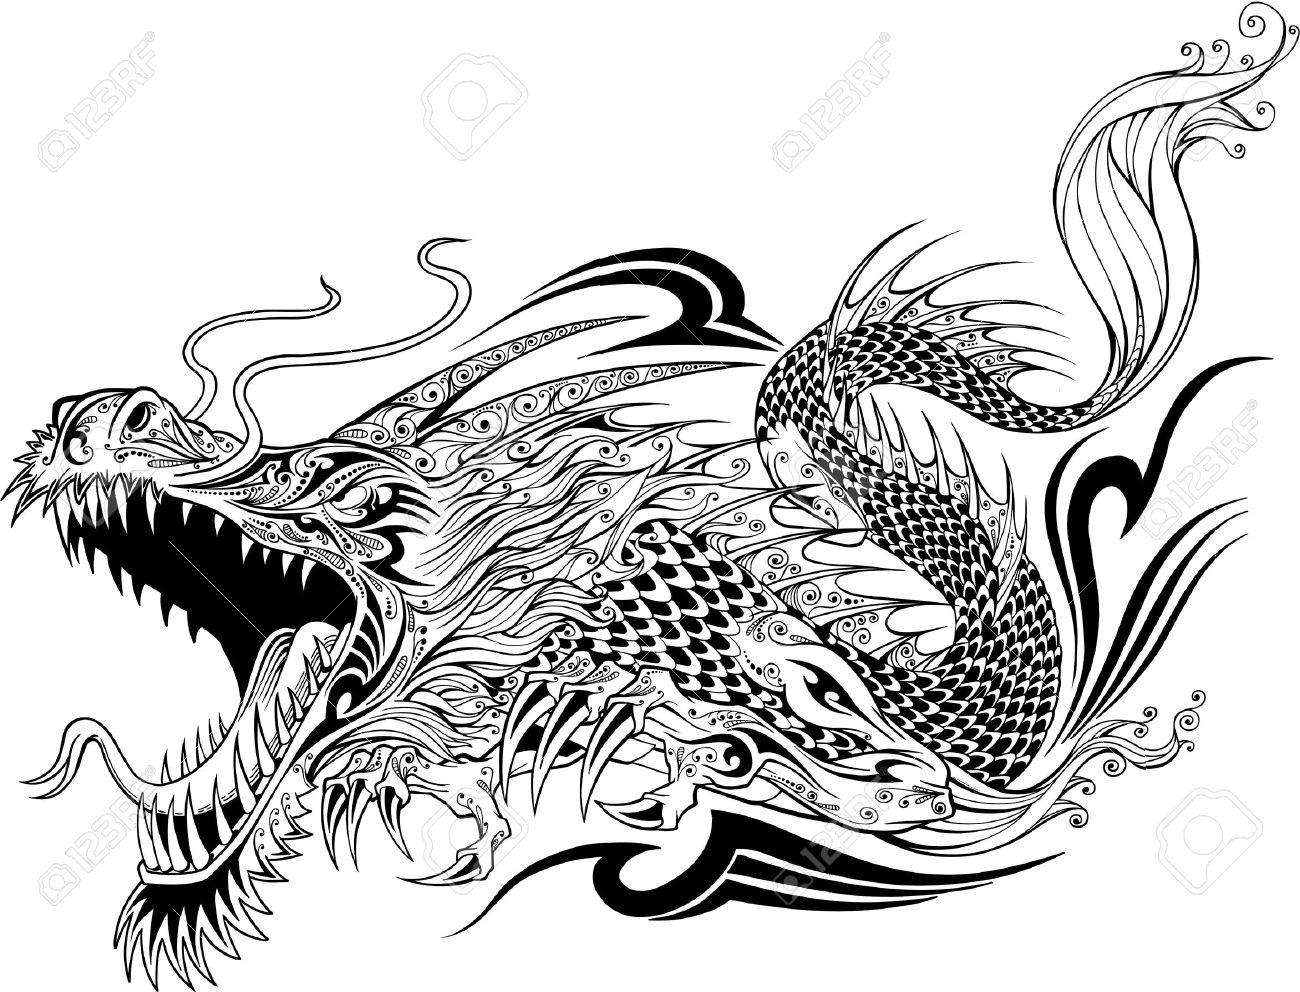 Dragon Doodle Sketch Tattoo - 17718139